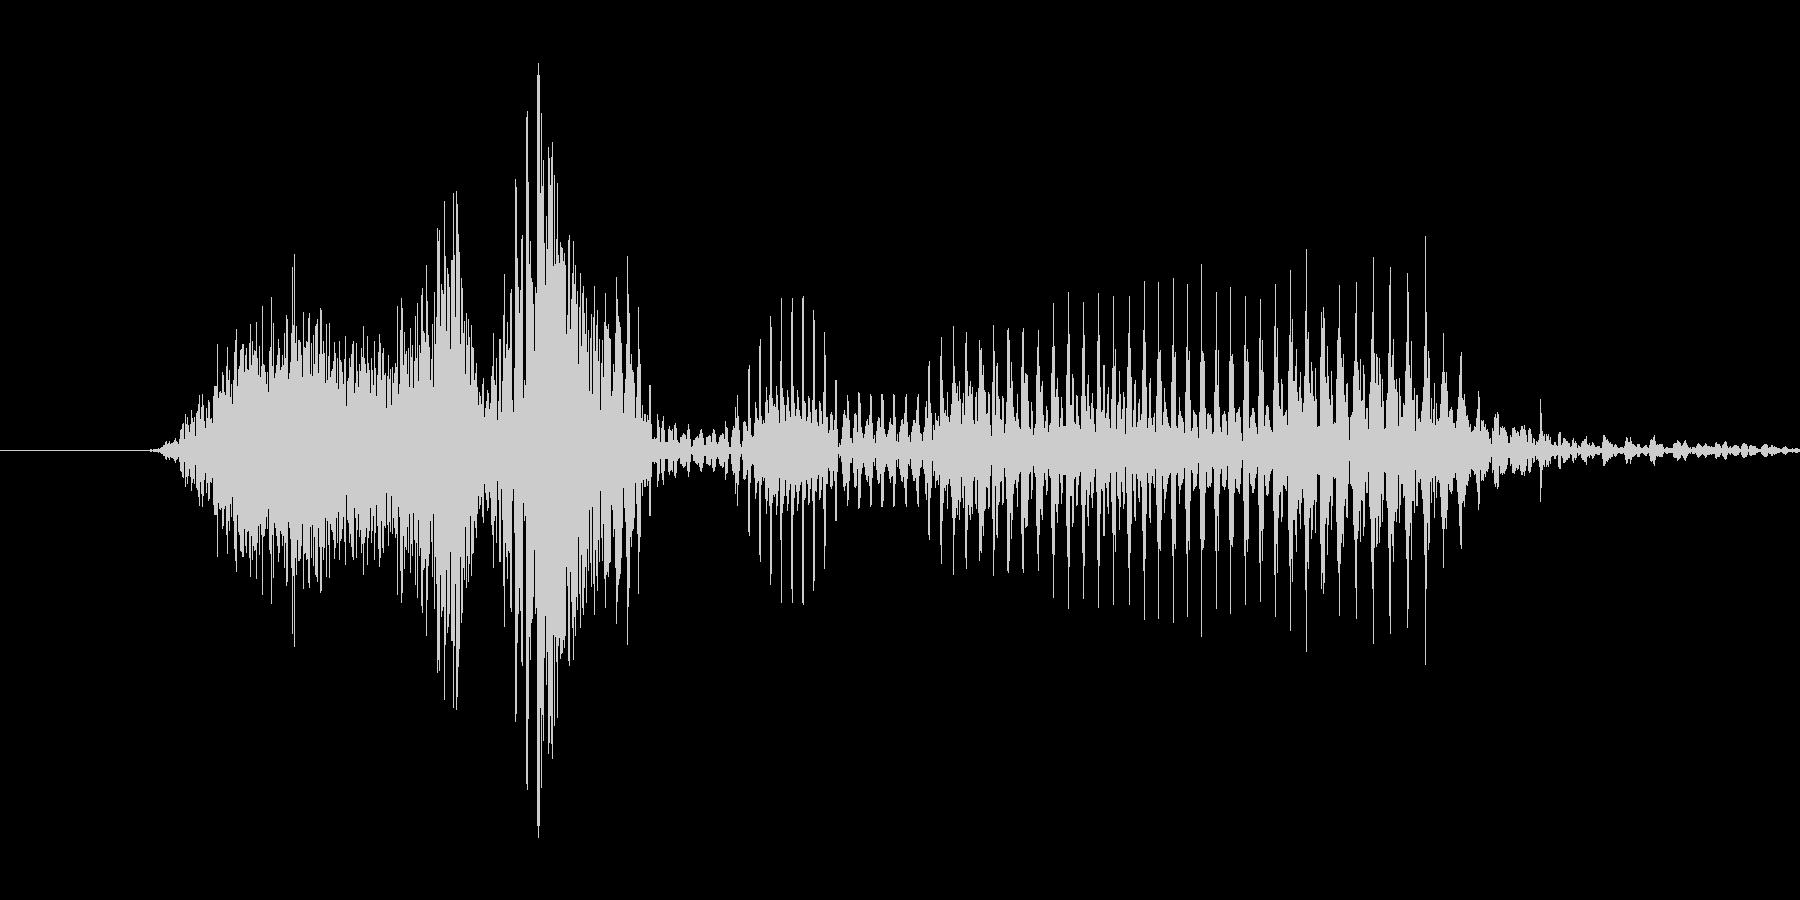 「7 AM」英語発音の未再生の波形